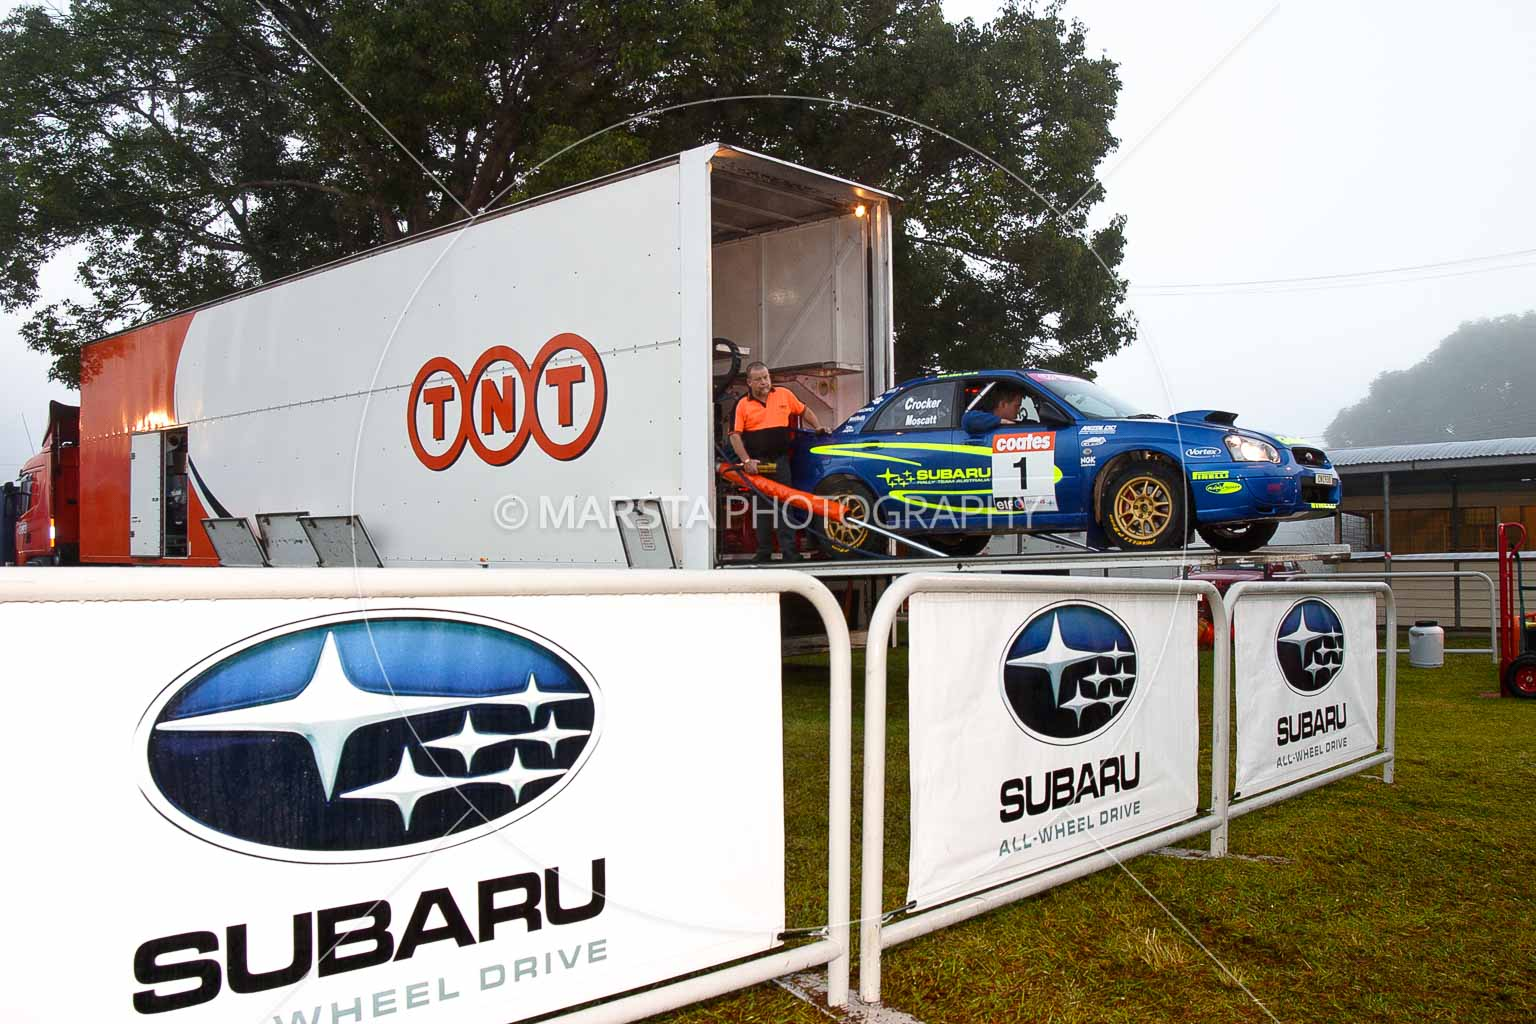 (1);050605ARC;4 June 2005;ARC;Australia;Australian Rally Championship;Coates Rally Queensland;Imbil;QLD;Queensland;Subaru Impreza WRX;Sunshine Coast;auto;crew;mechanics;morning;motorsport;racing;service park;transporter;wide angle